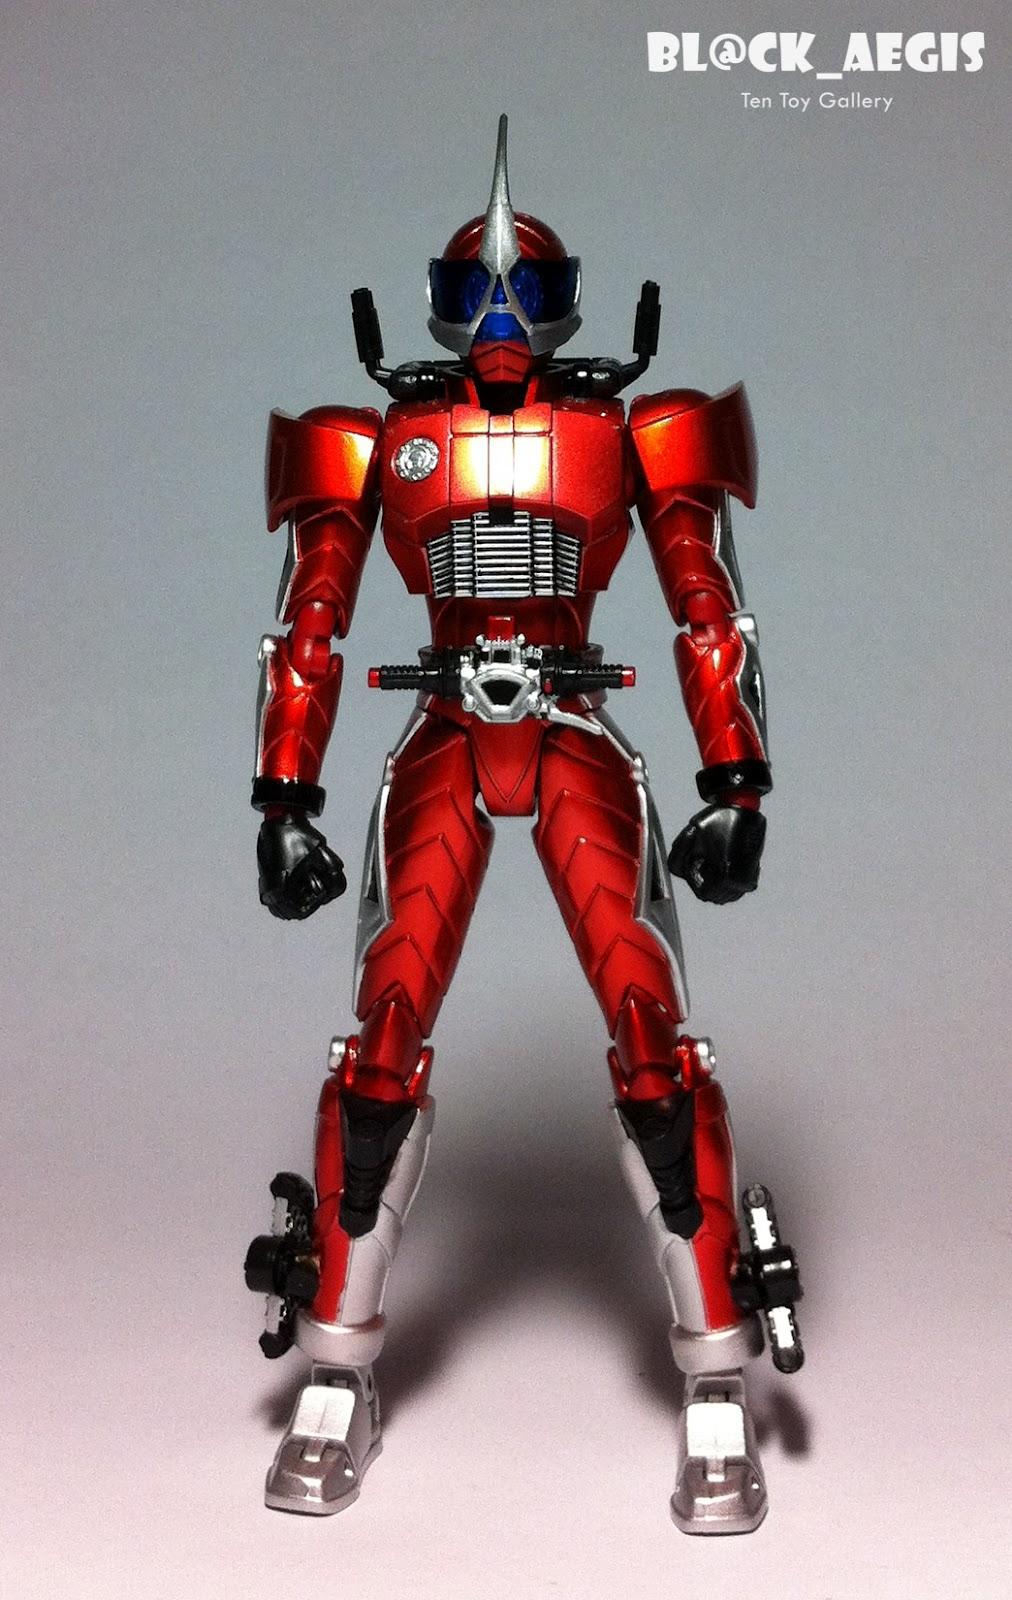 S.H. Figuarts Shinkocchou Seihou Kamen Rider Accel Gallery ...  Kamen Rider Accel